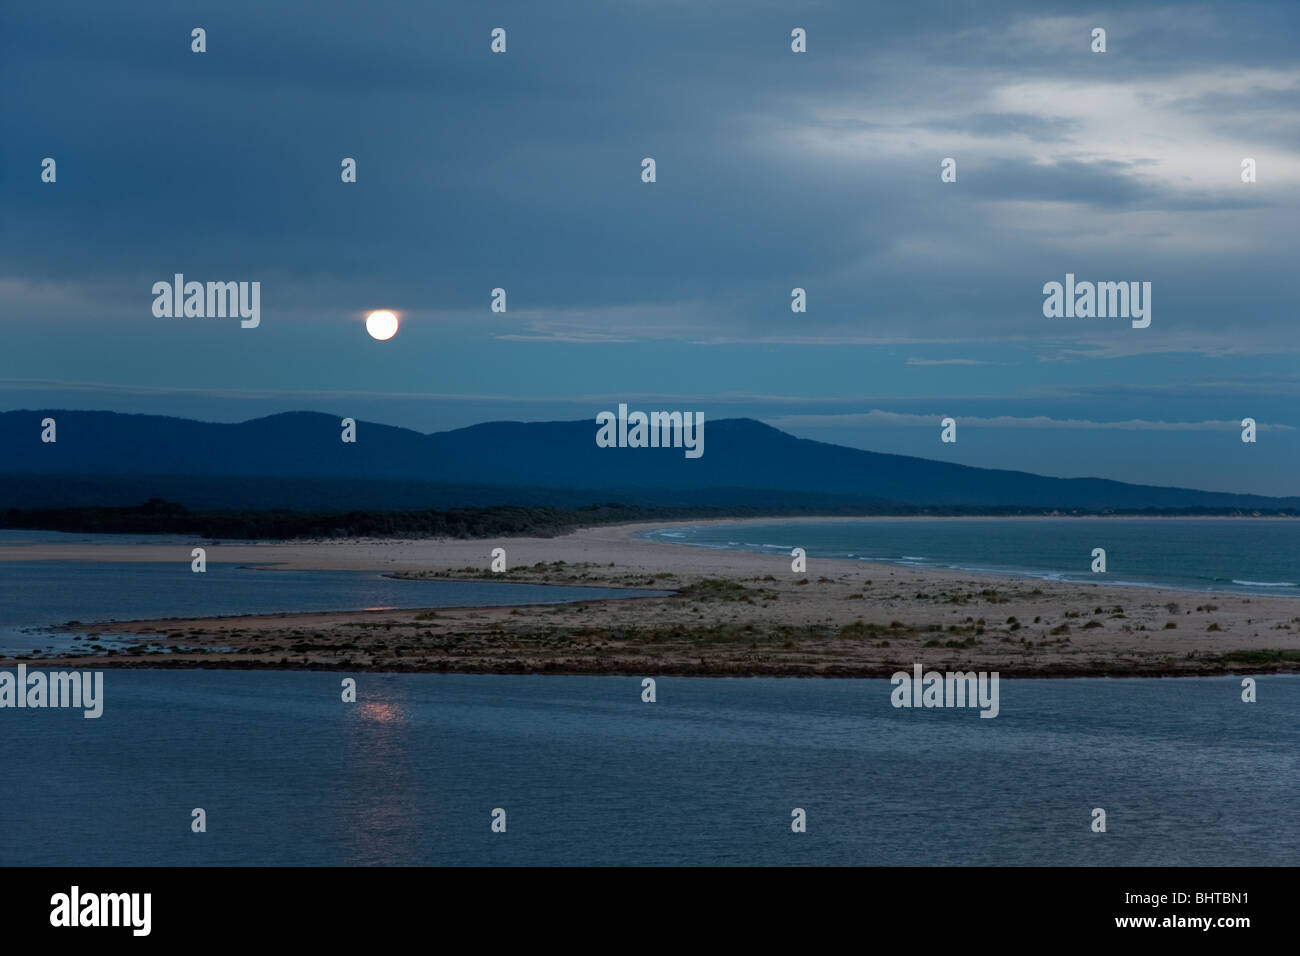 Full moon rising at dusk over mountains, lake, and sea. Location: Mallacoota, East Gippsland, Victoria, Australia Stock Photo